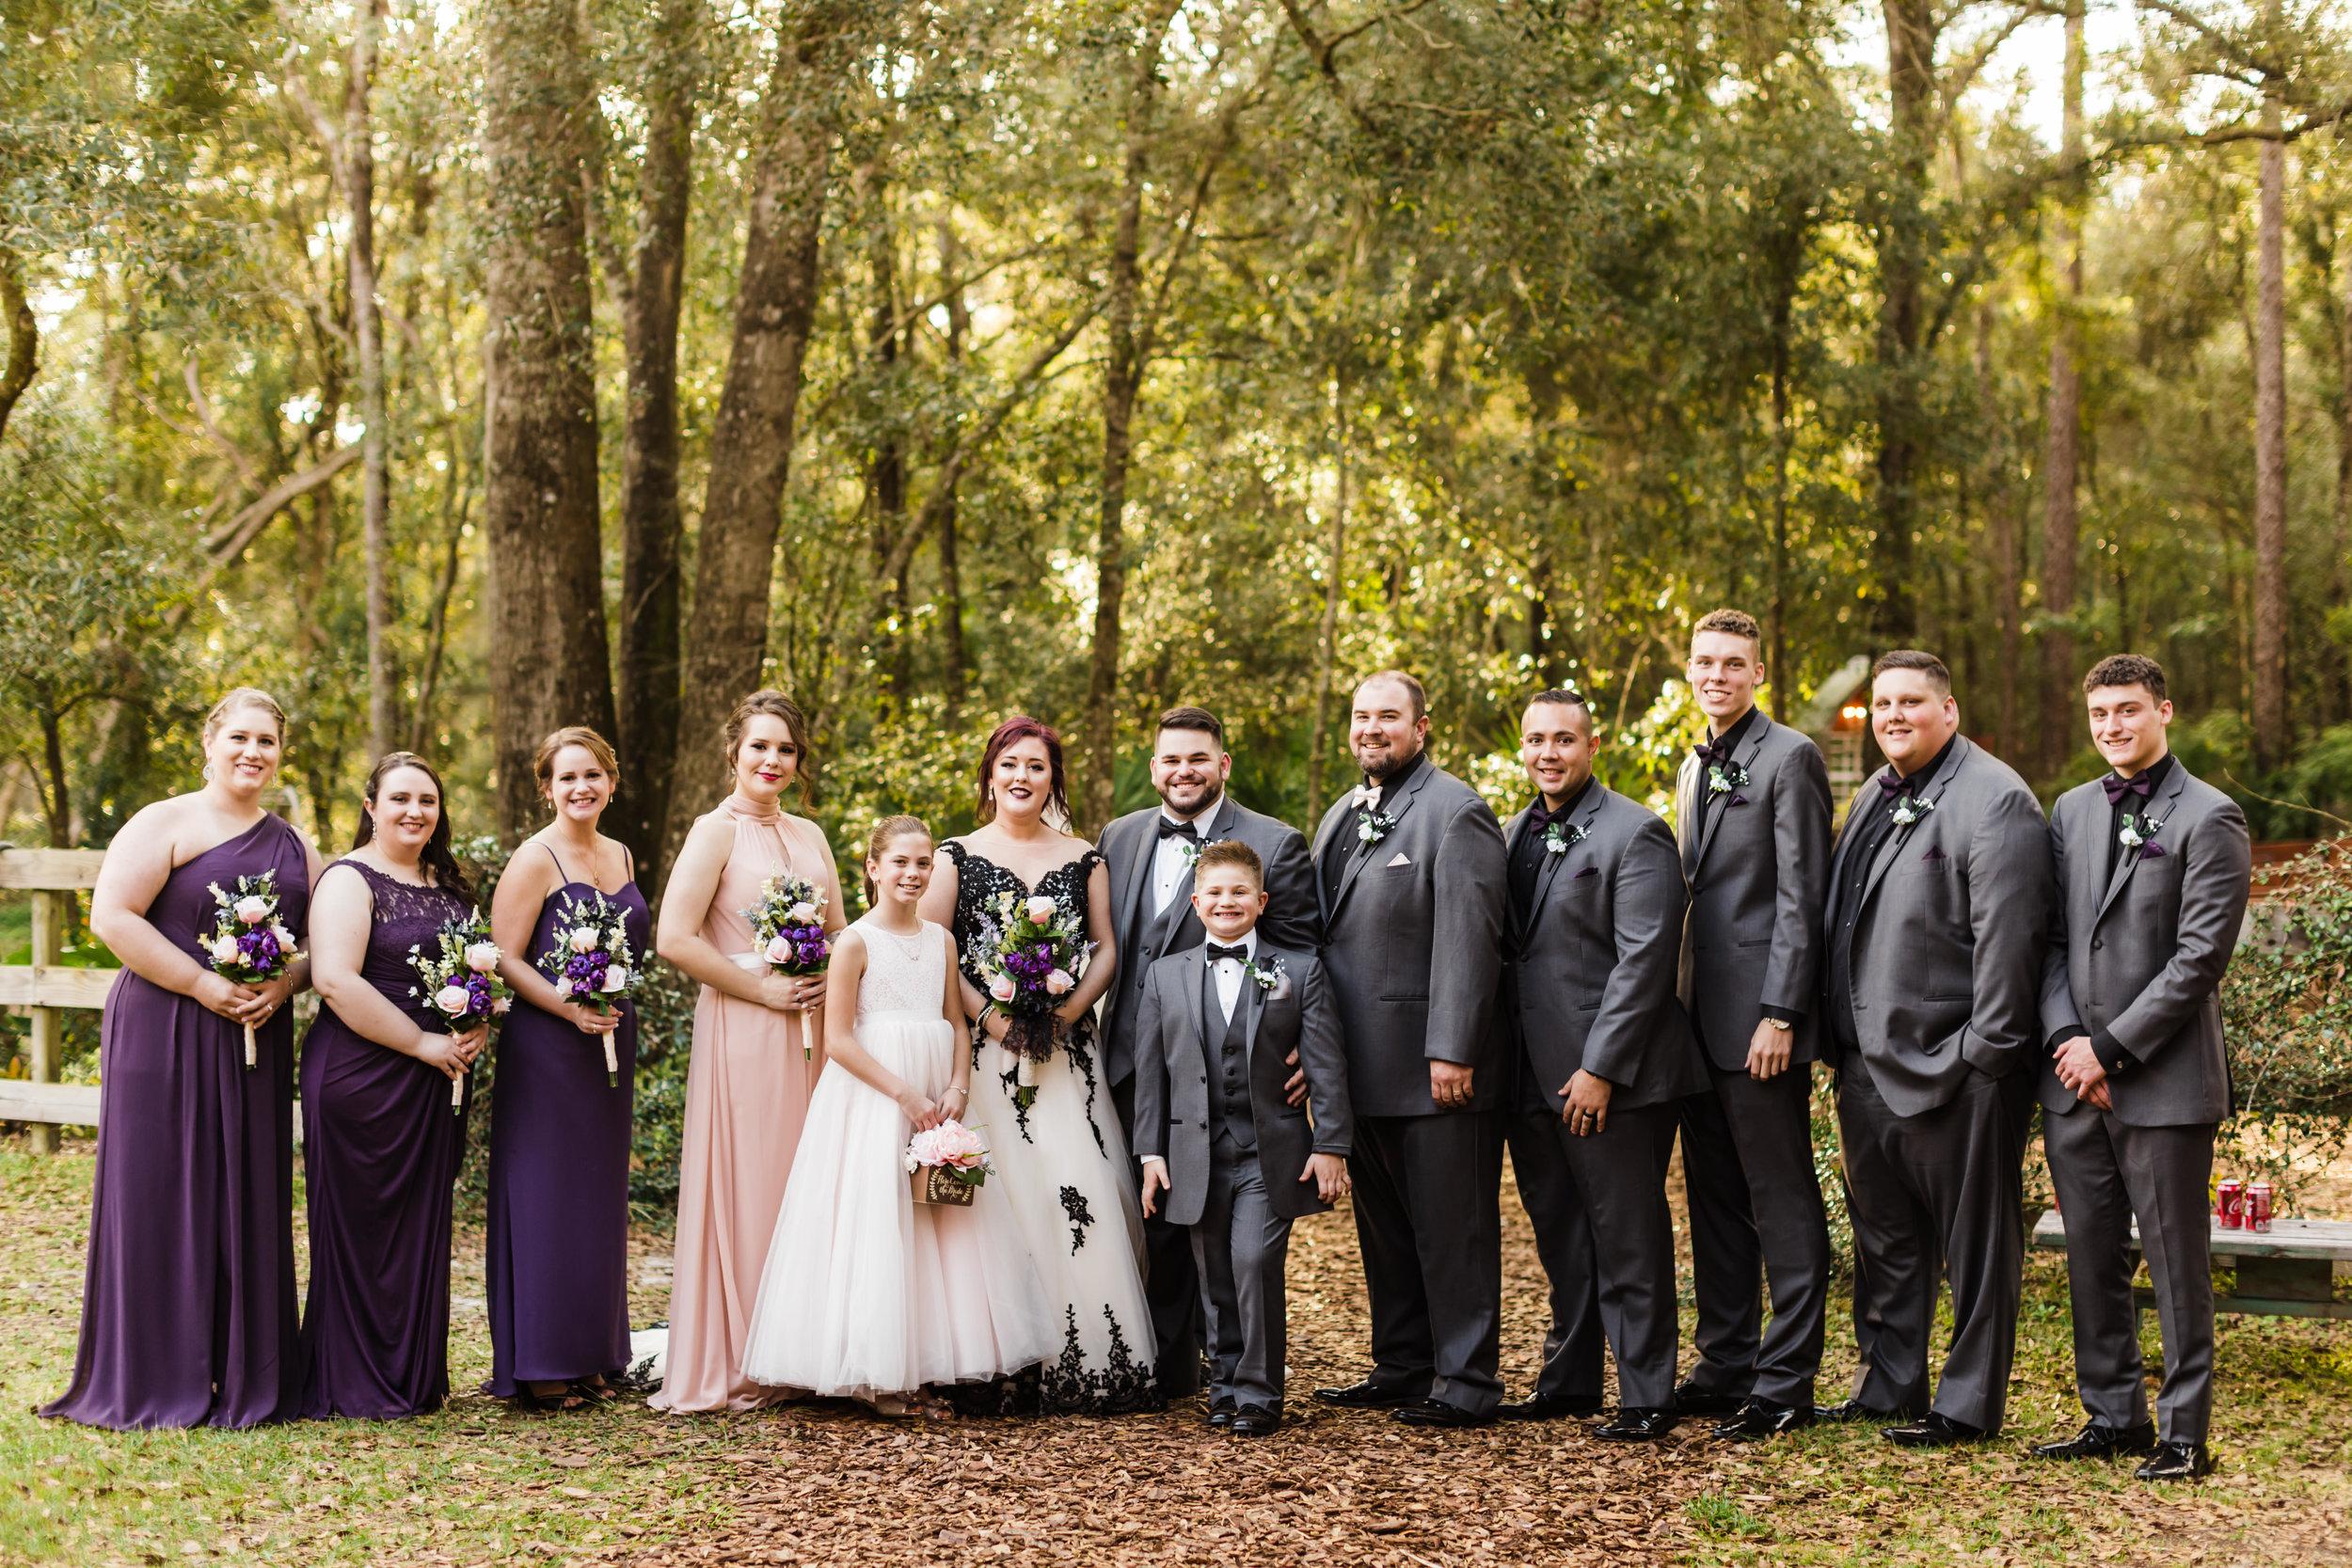 2019.01.12 Ashley and Nathan Bridle Oaks Wedding (560 of 1091).jpg